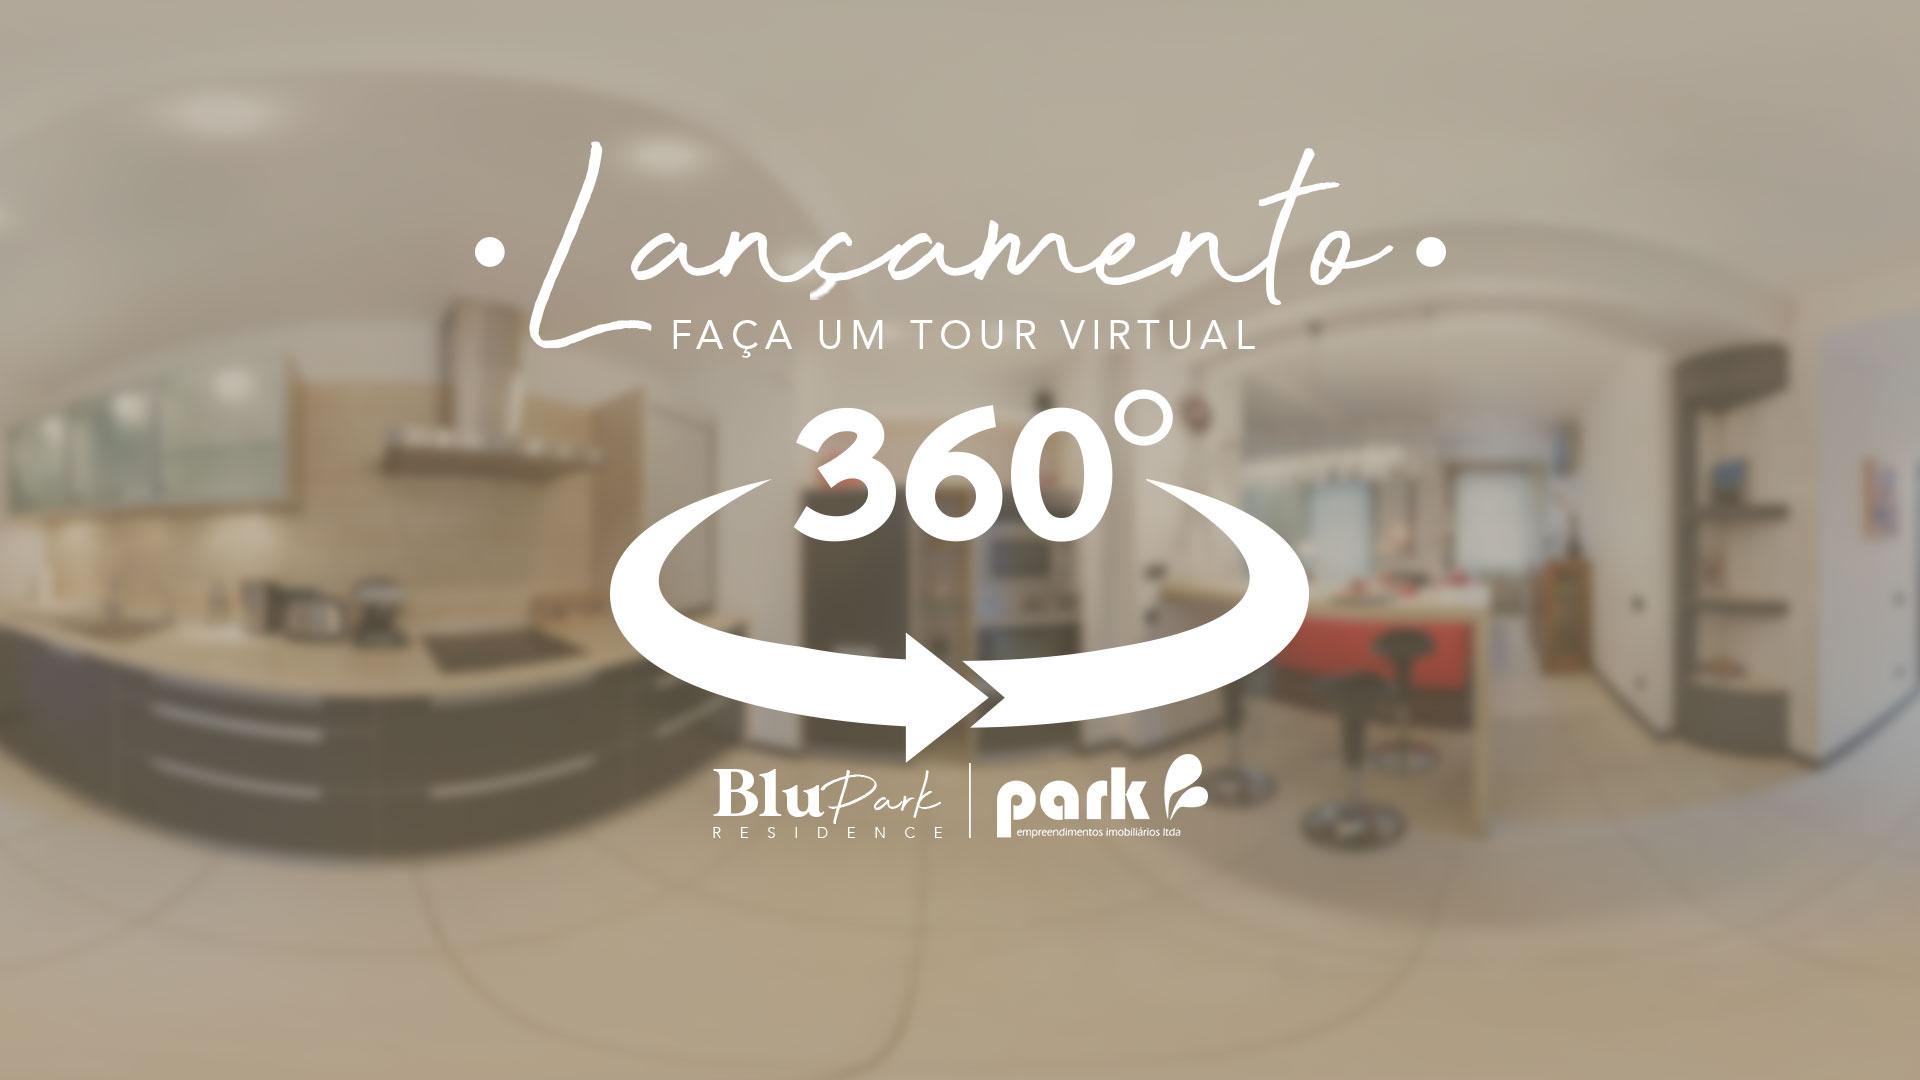 Blu Park 1